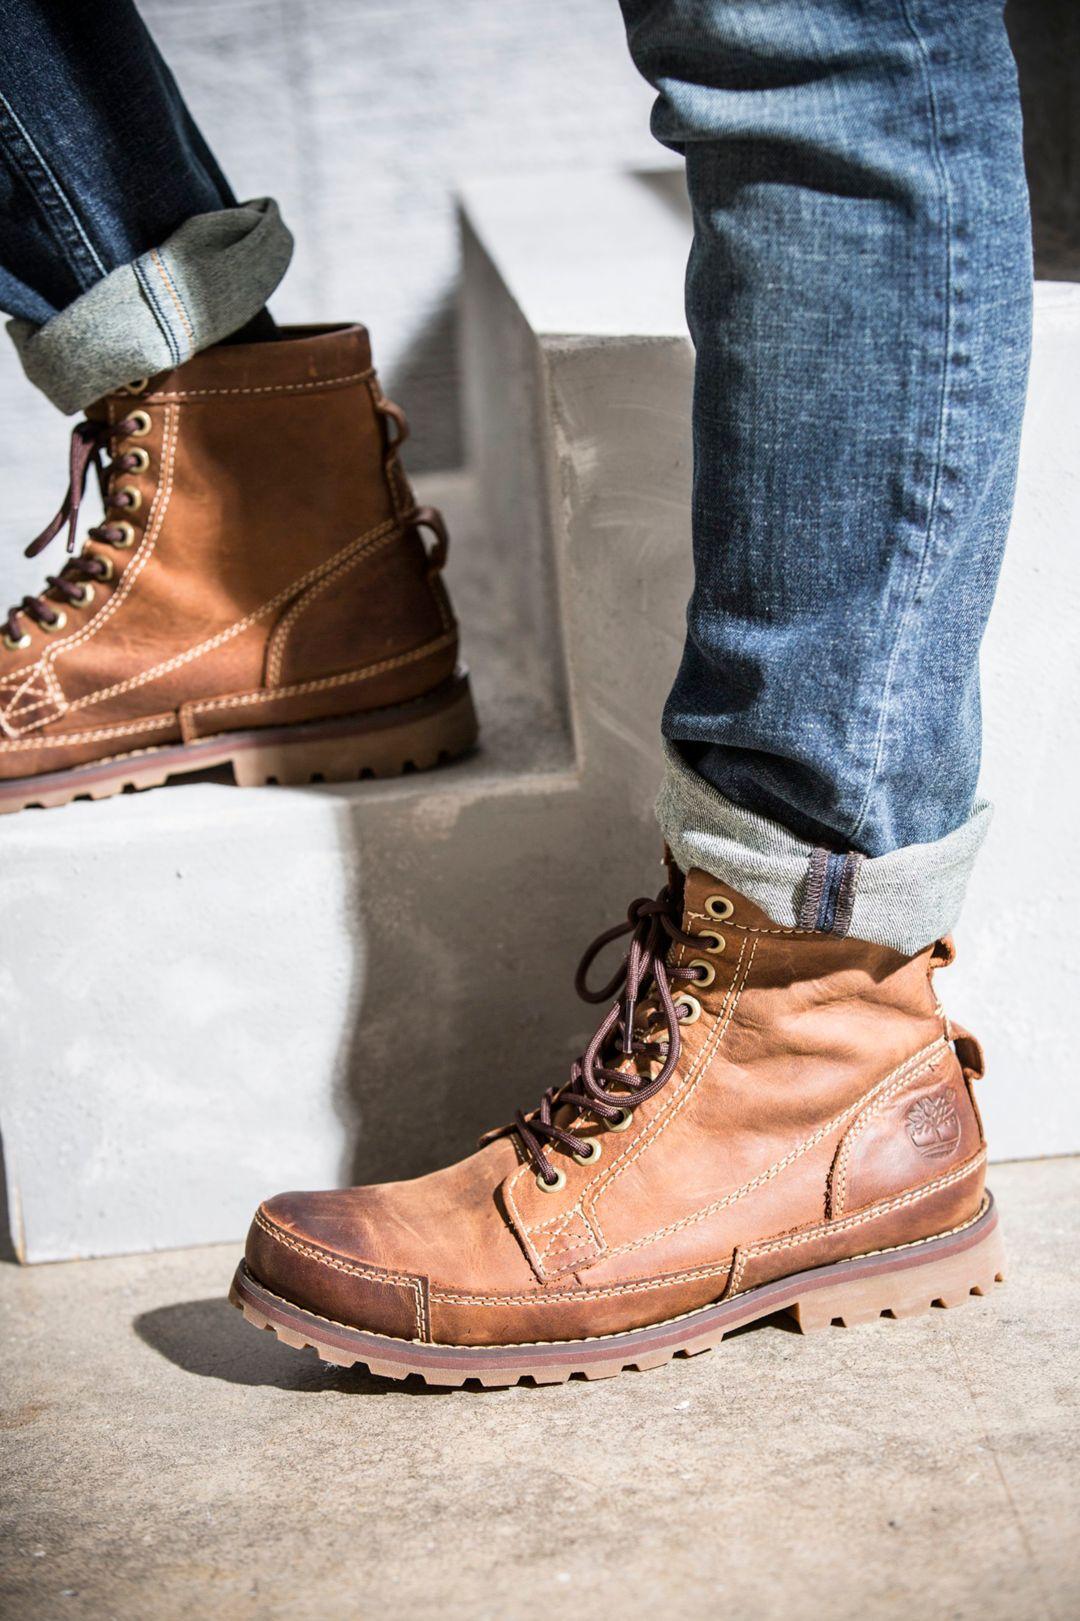 71d37c3d881 Timberland Men's Earthkeepers Original 6'' Boots